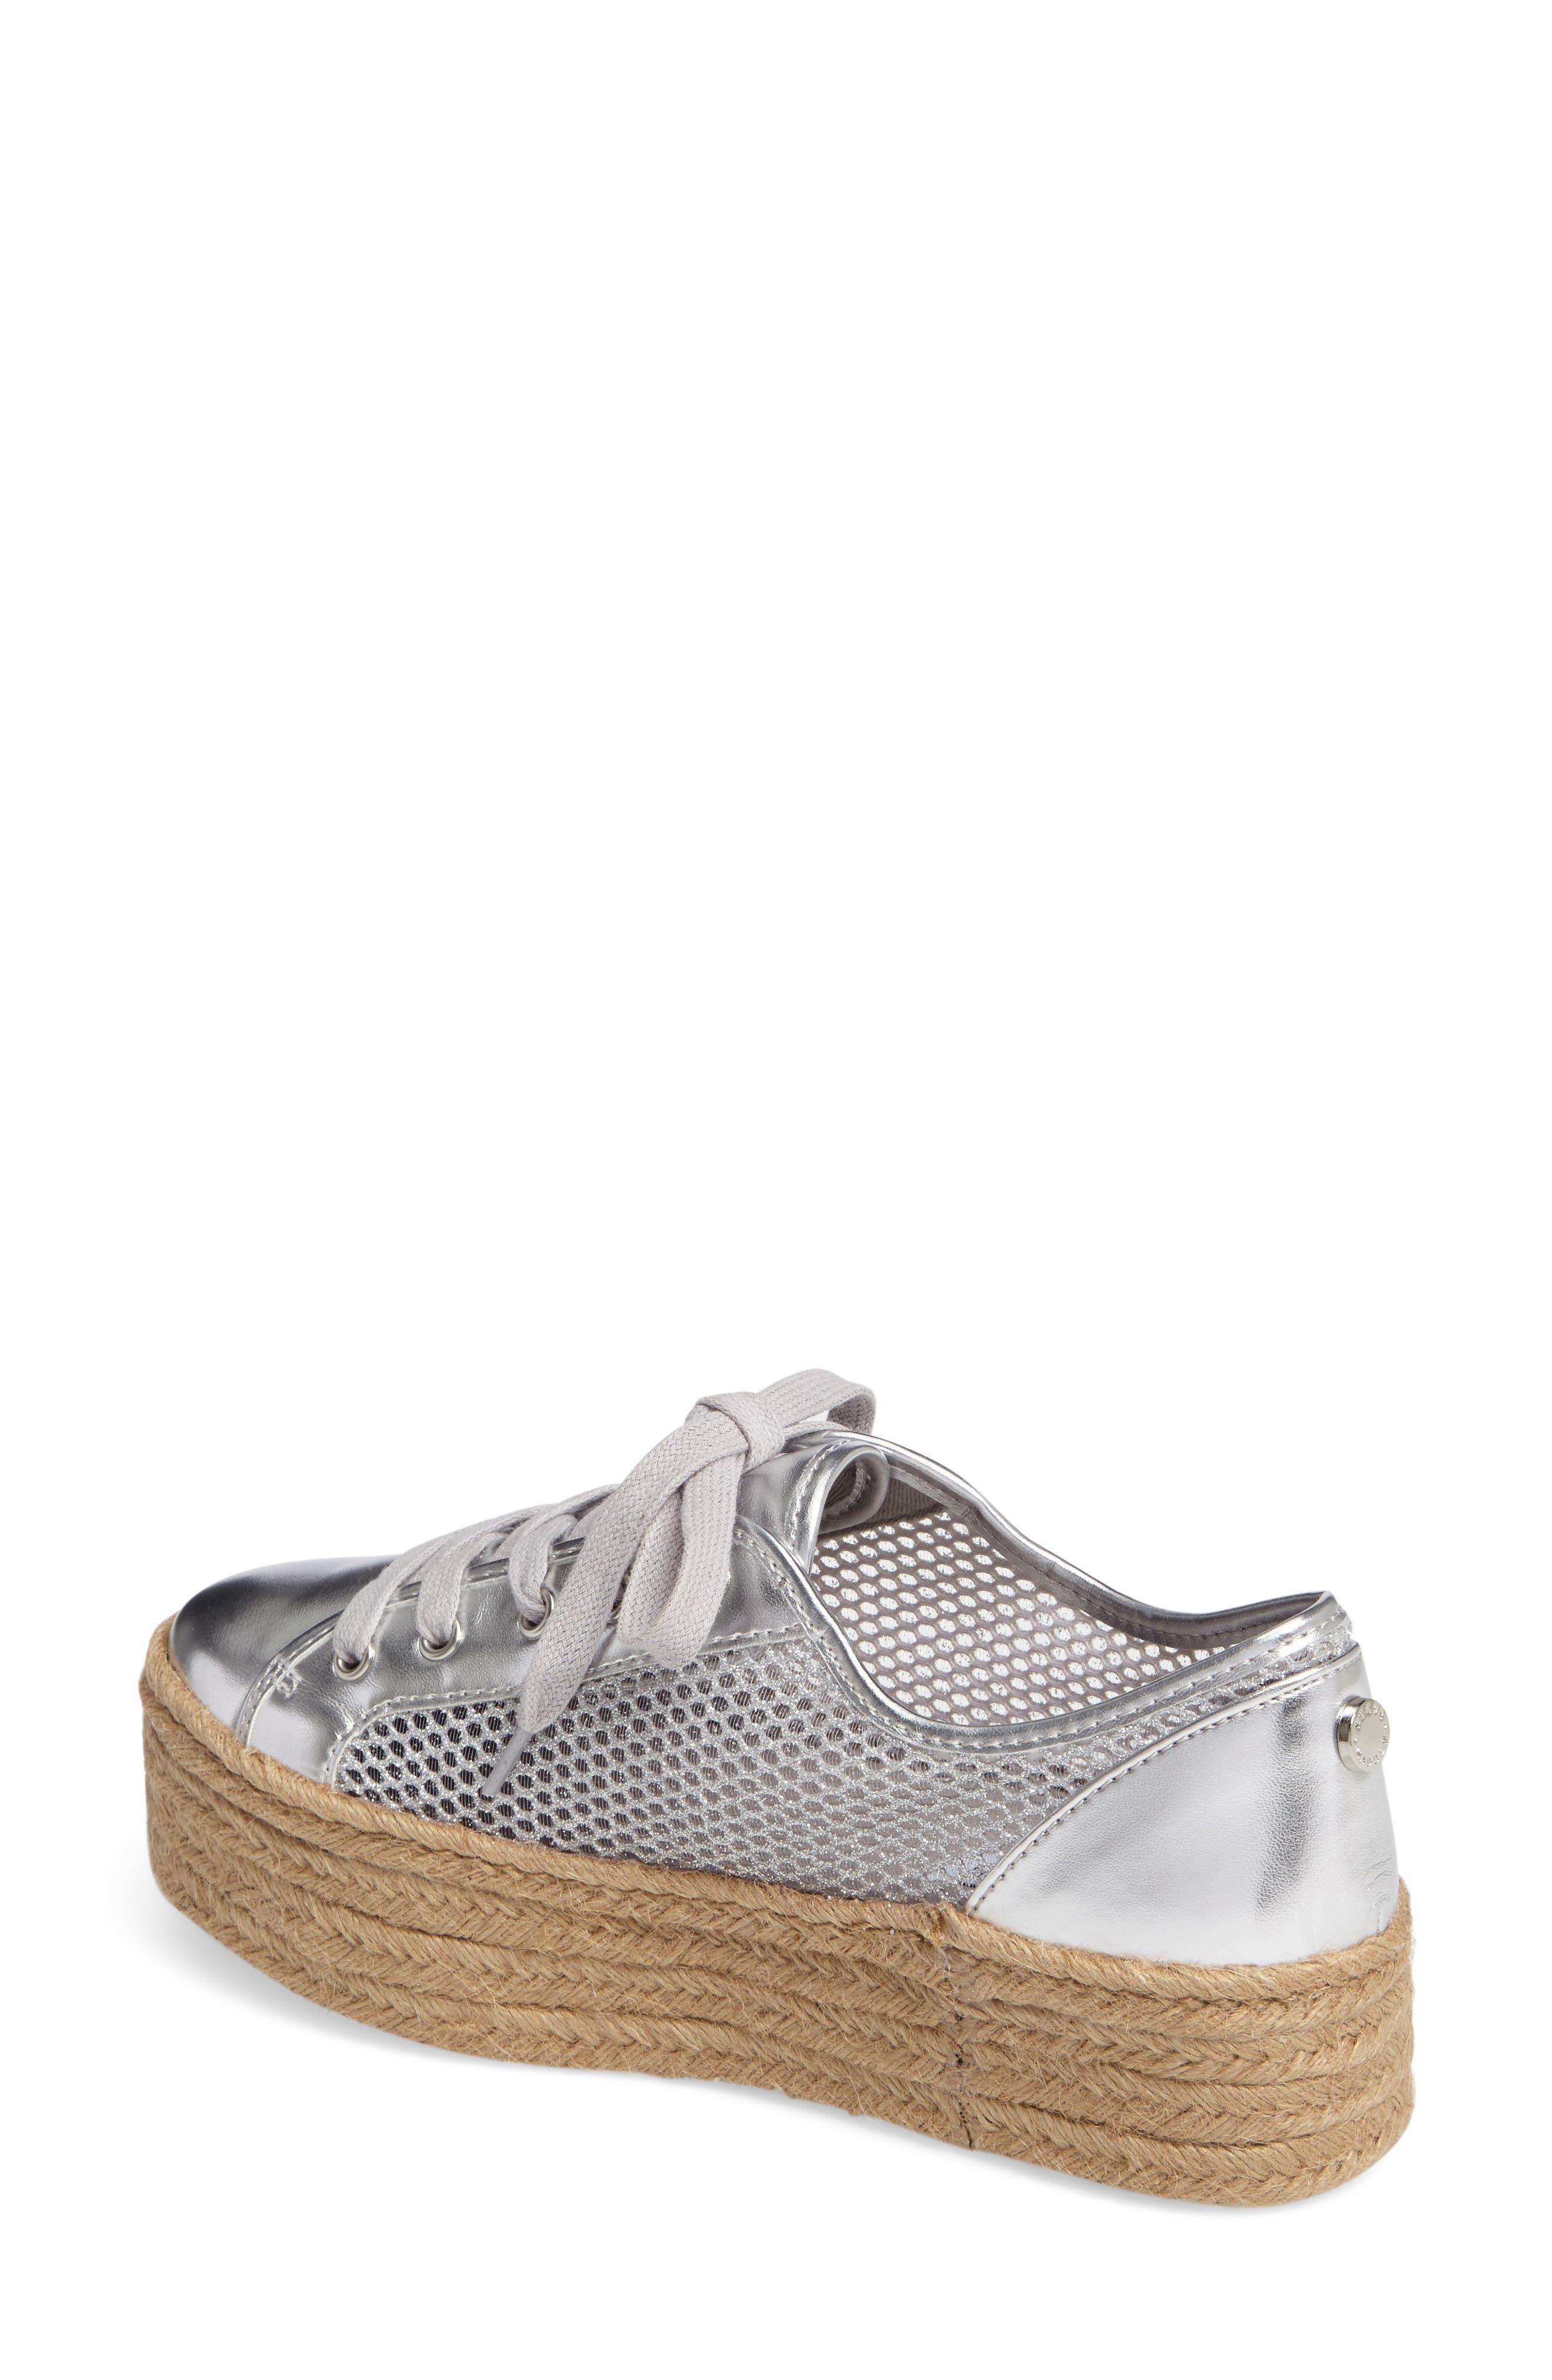 Mars Platform Sneaker,                             Alternate thumbnail 2, color,                             040